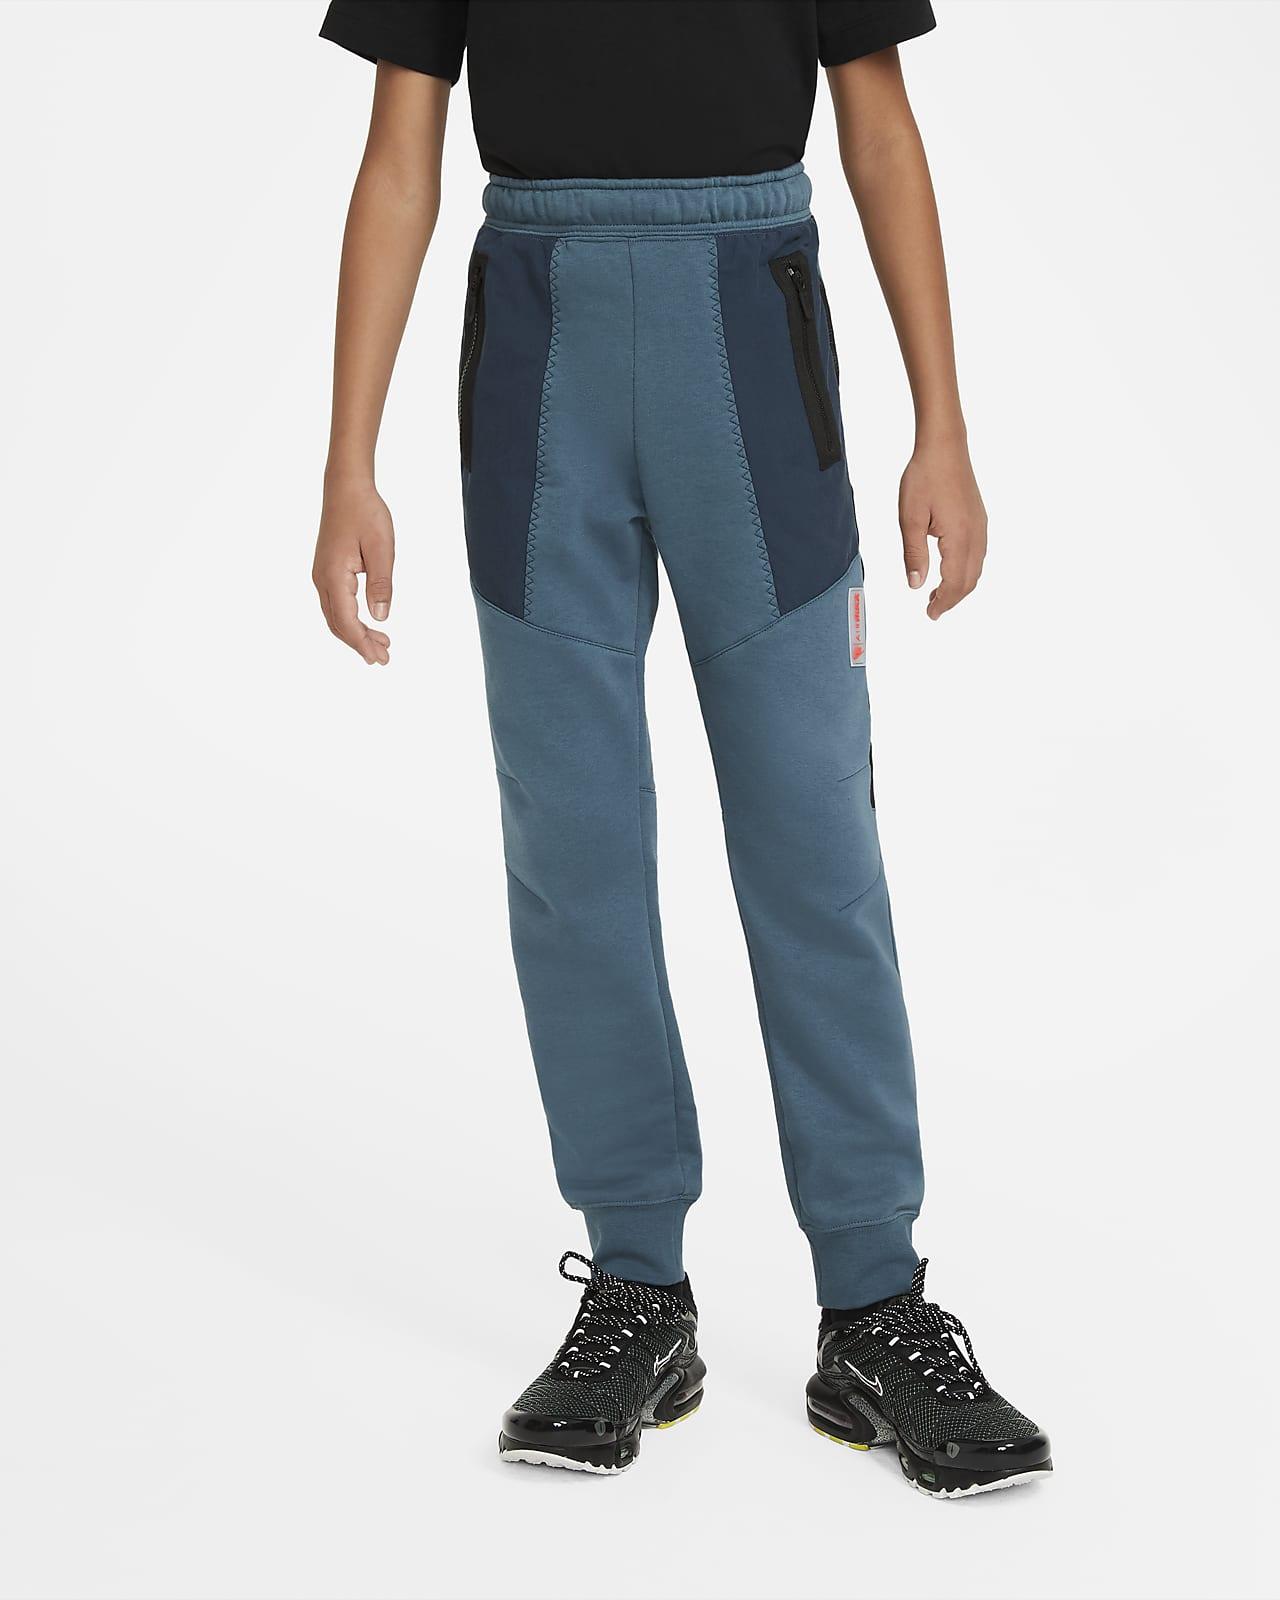 Nike Sportswear Air Max Fleece-Hose für ältere Kinder (Jungen)